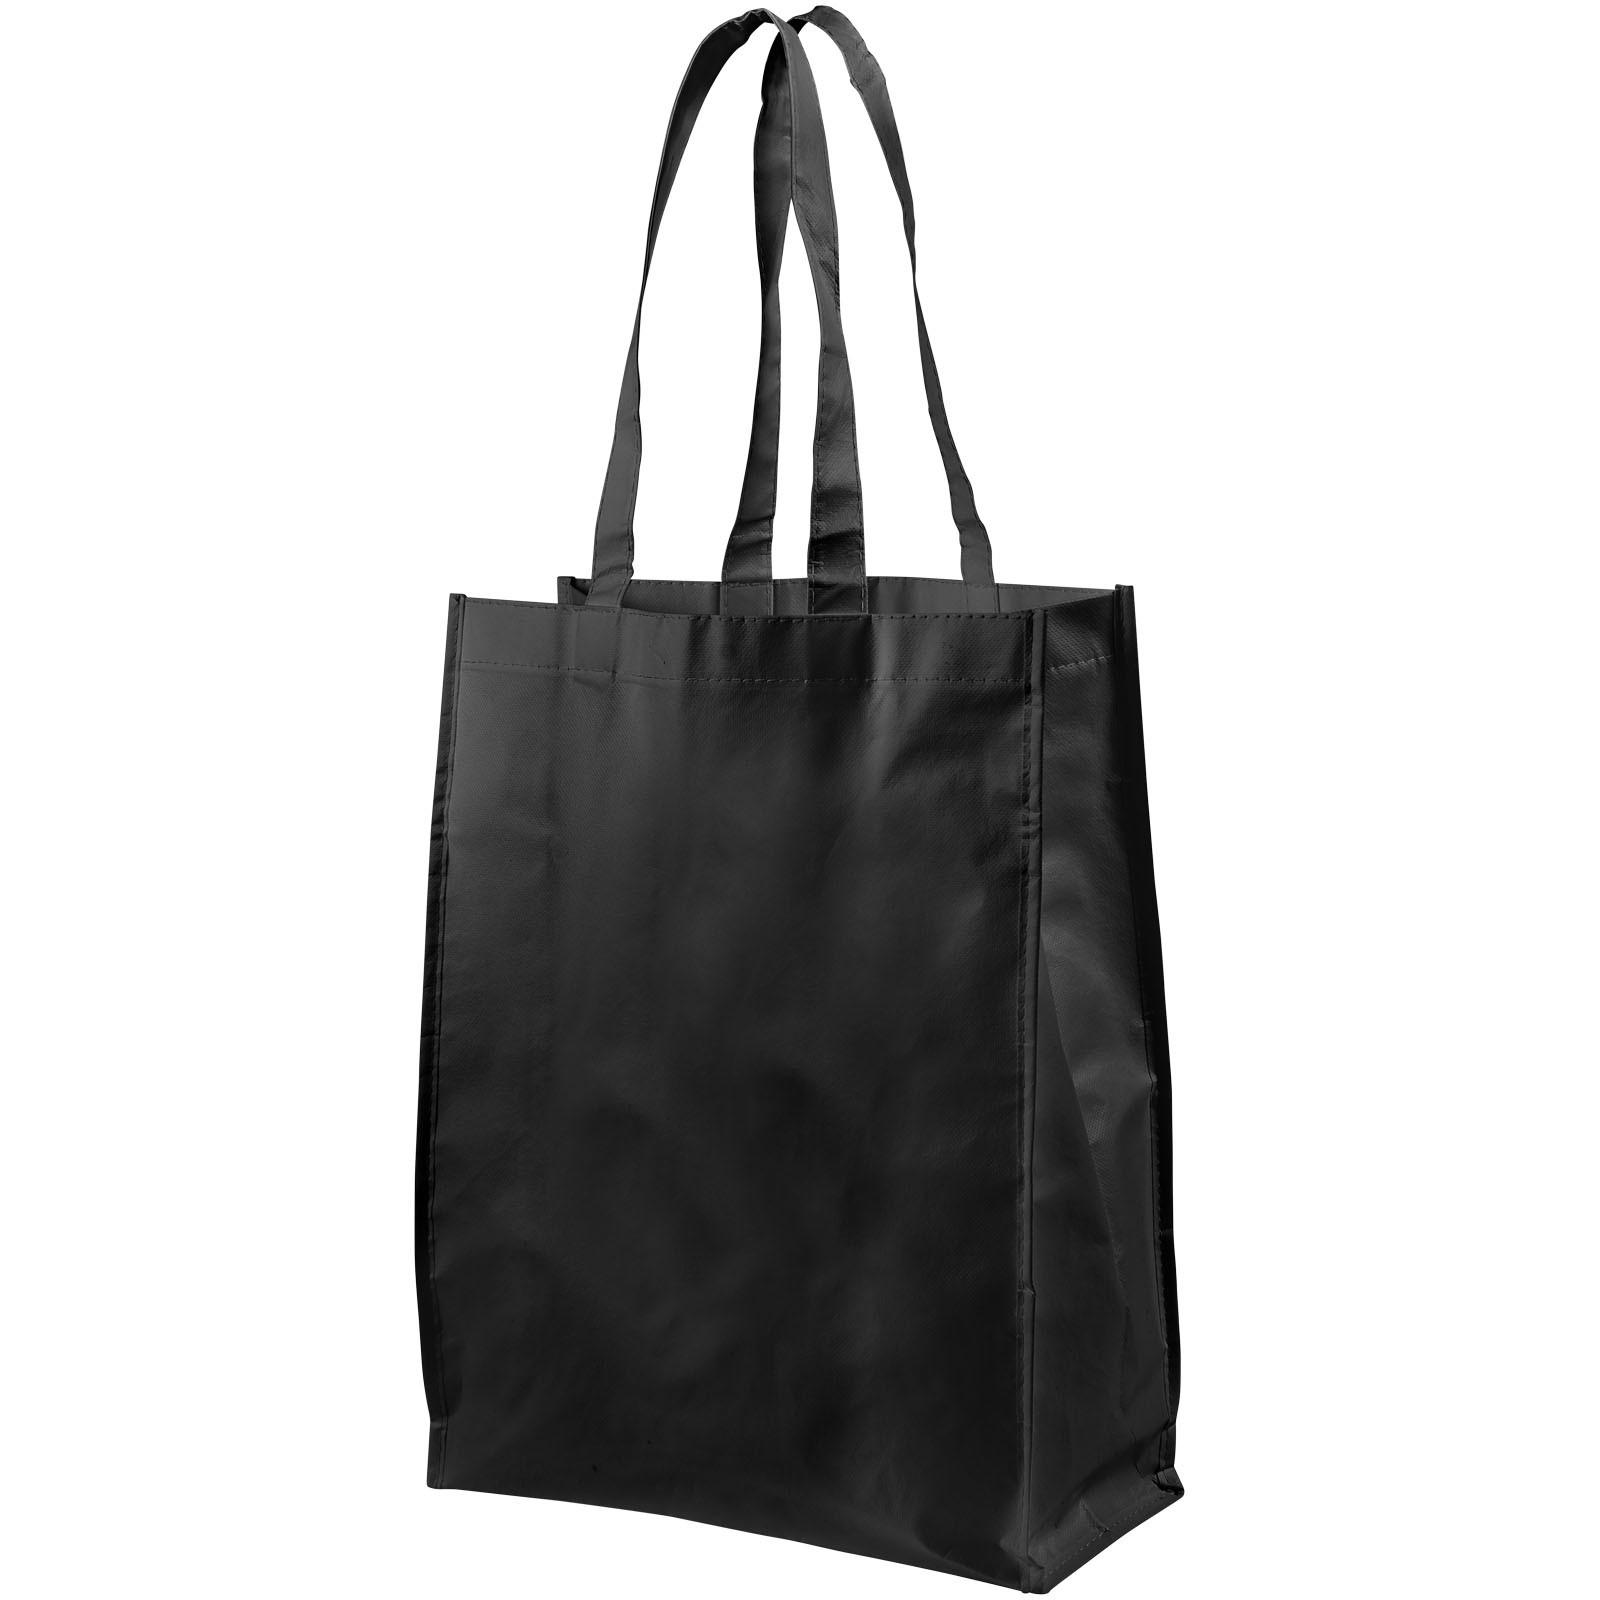 Conessa laminated shopping tote bag - Solid black